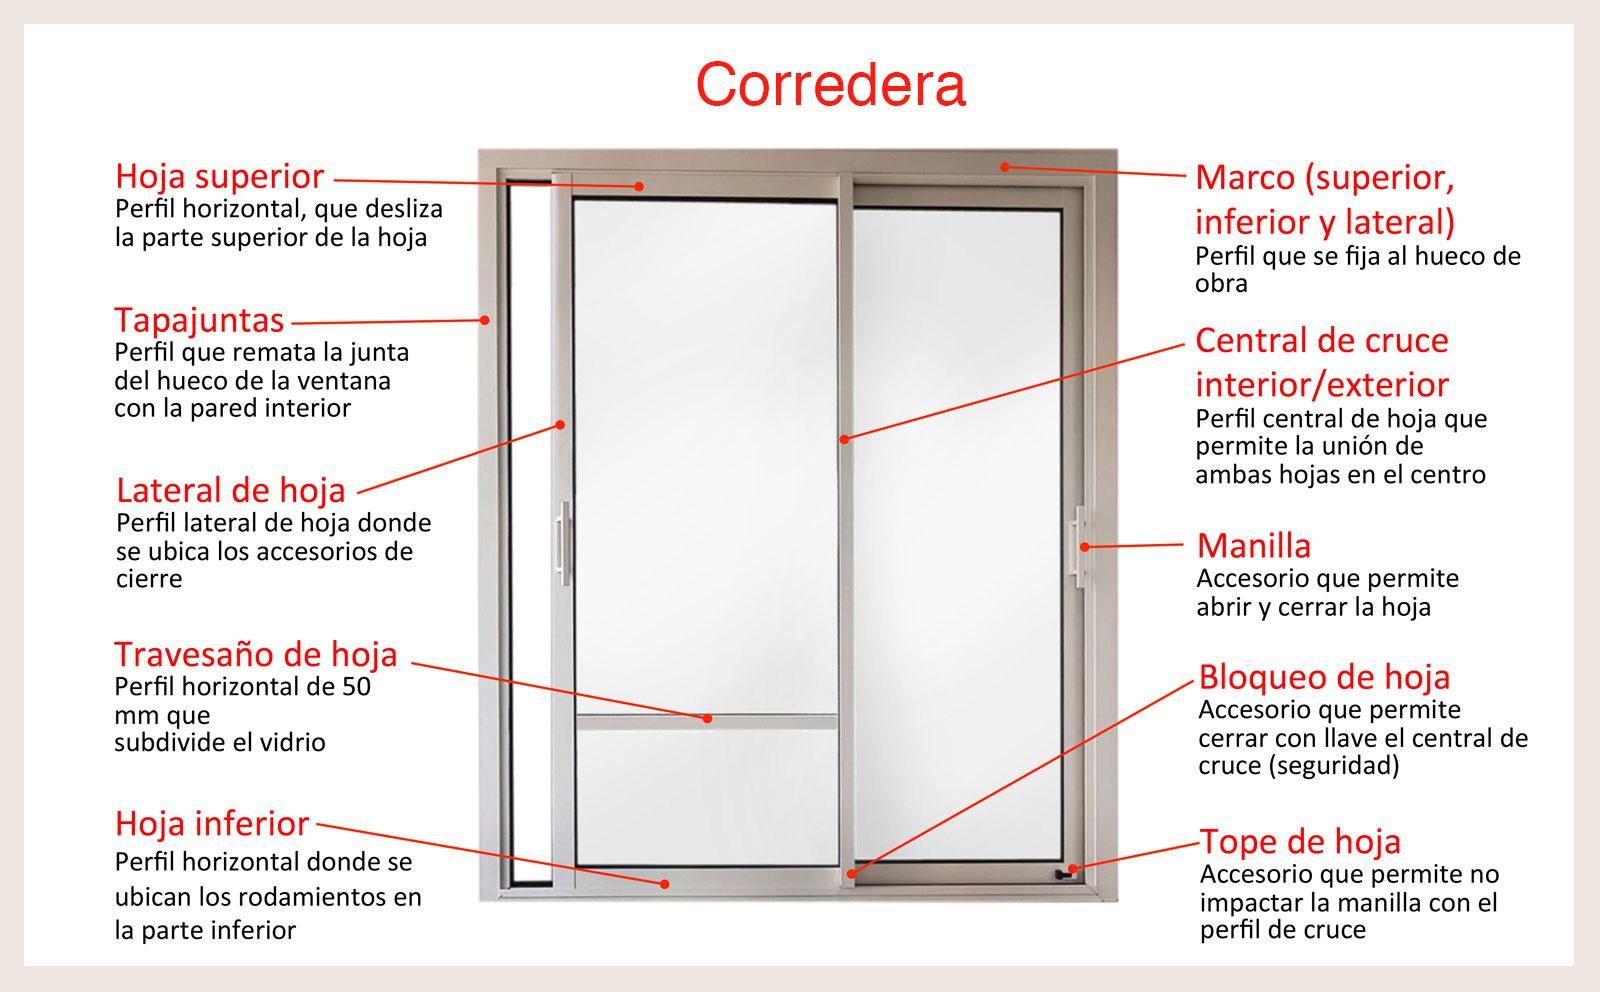 CORREDERA